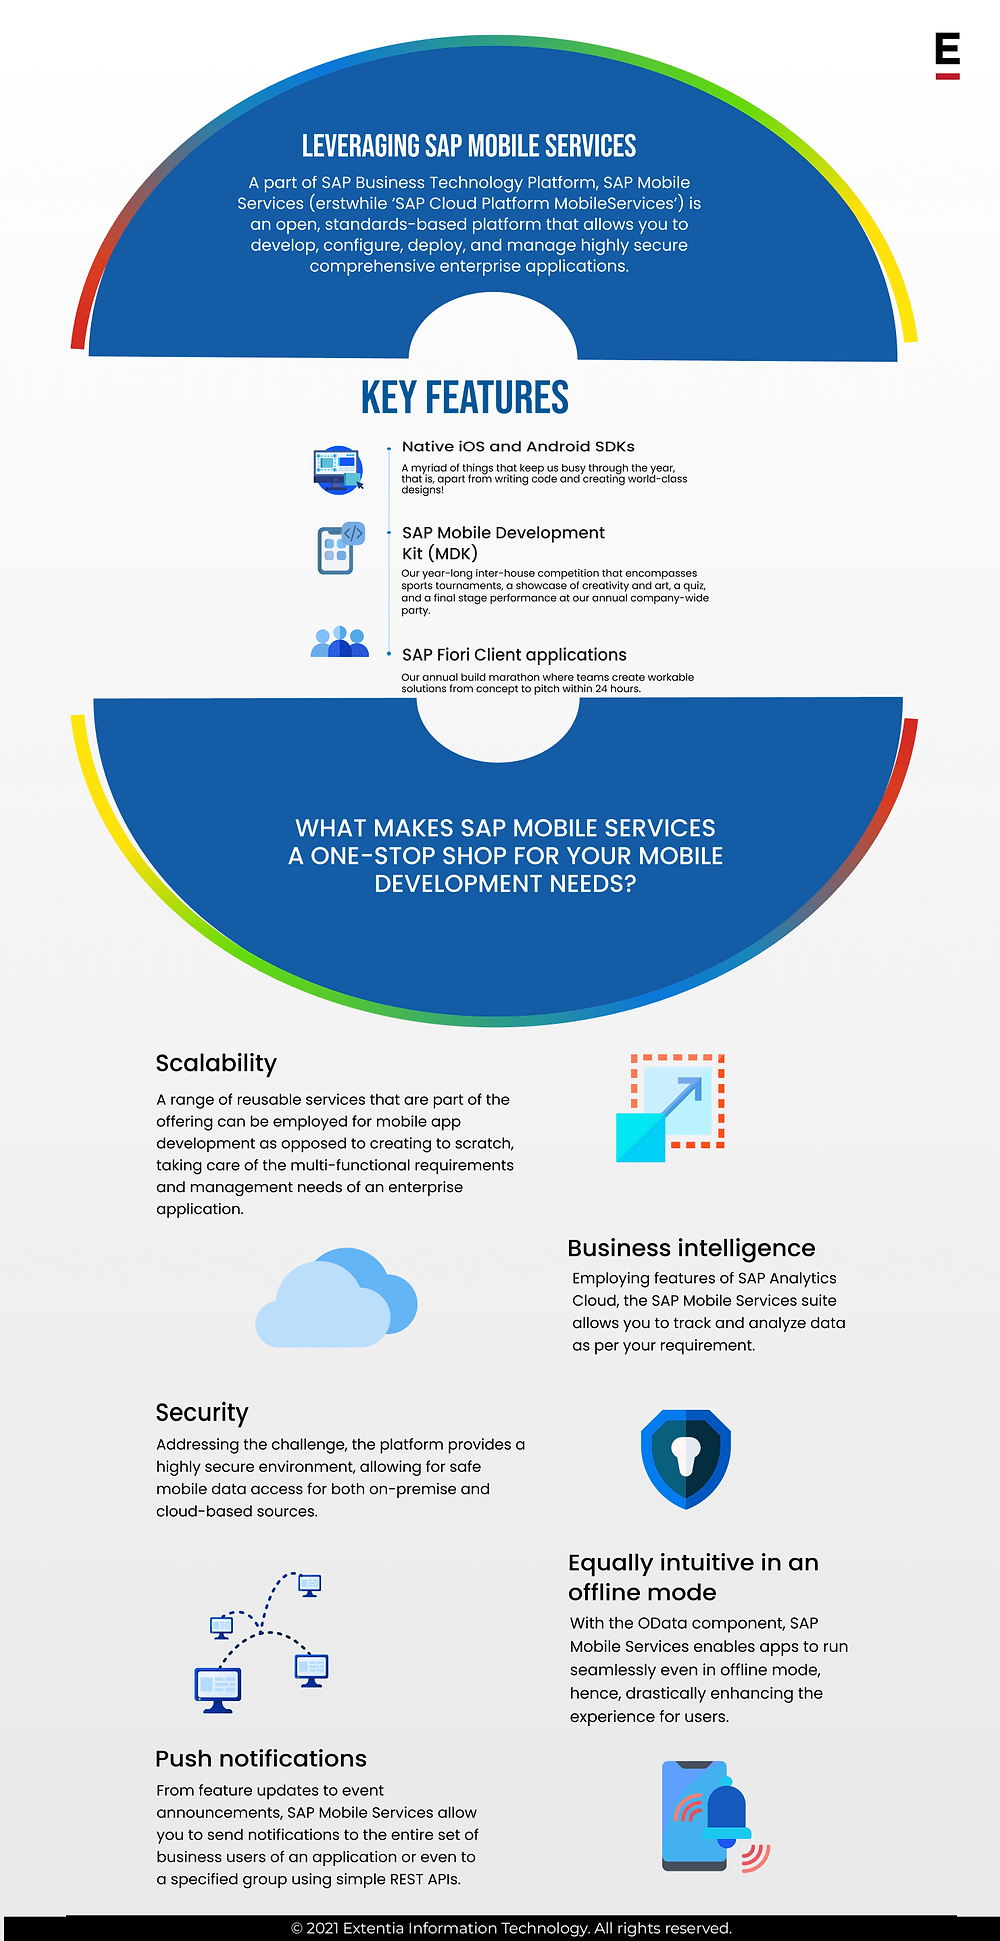 leveraging SAP mobile services